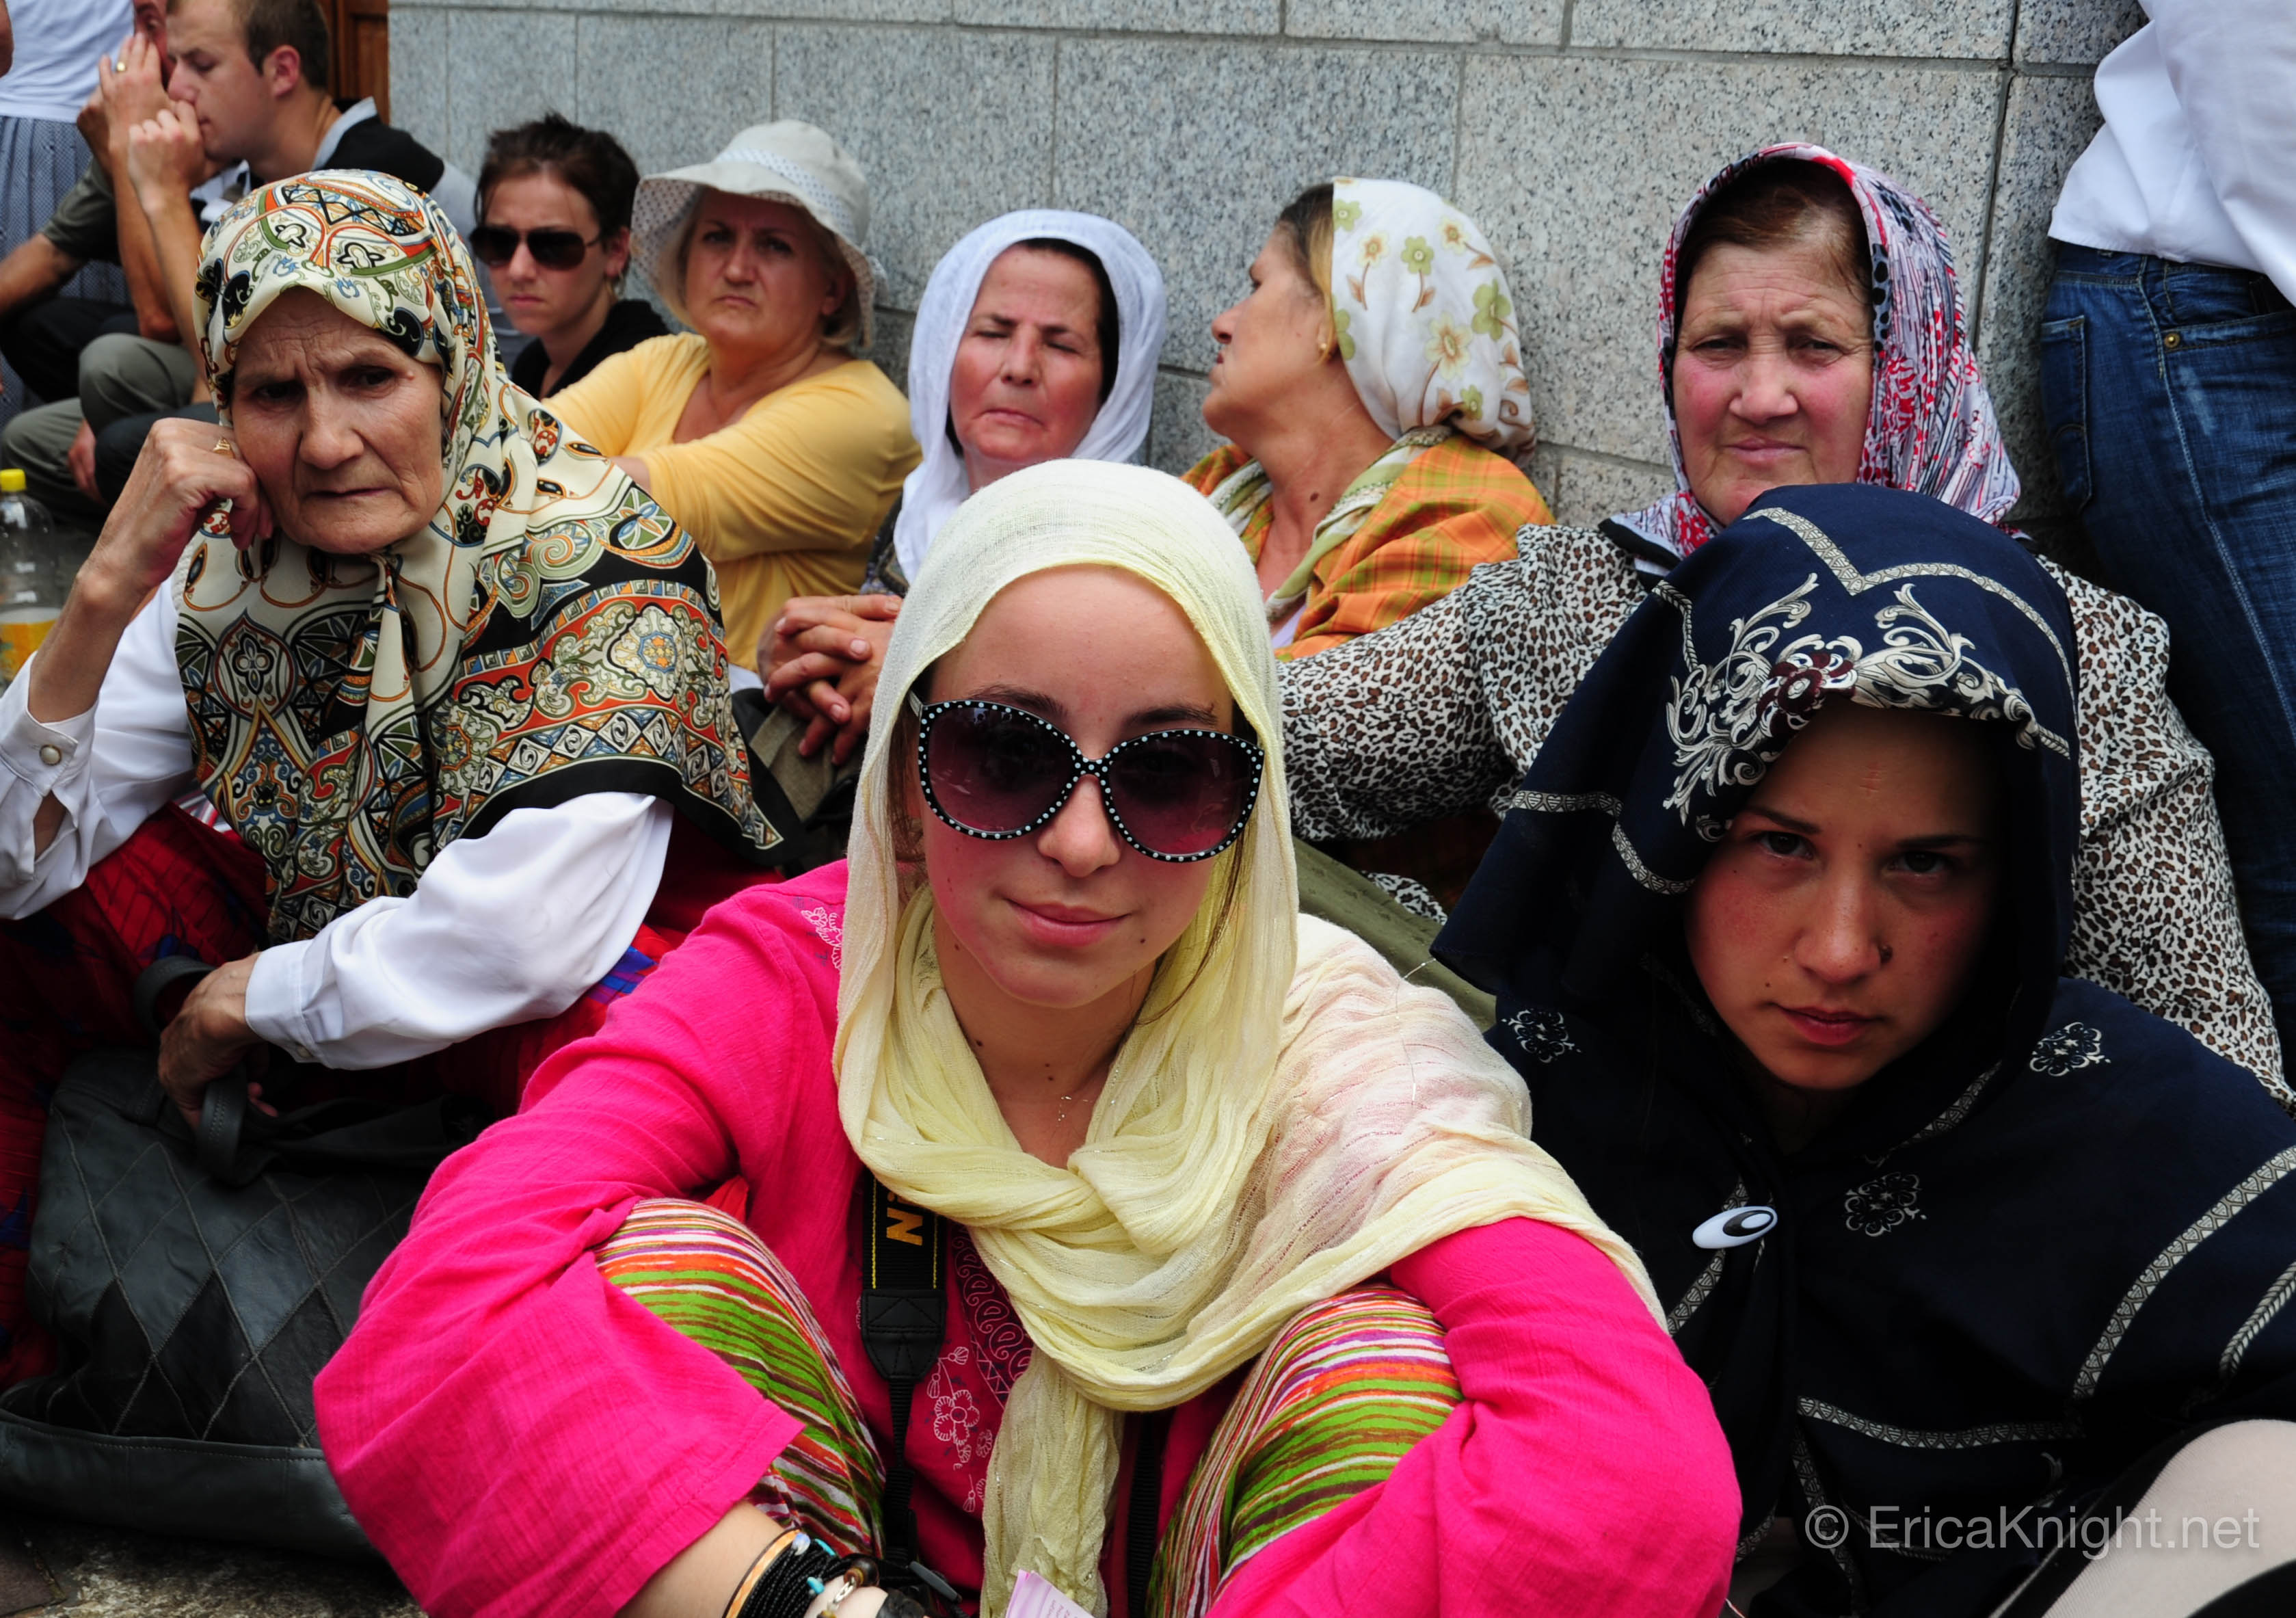 Women at 2011 Massacre Memorial - Srebrenica, Bosnia